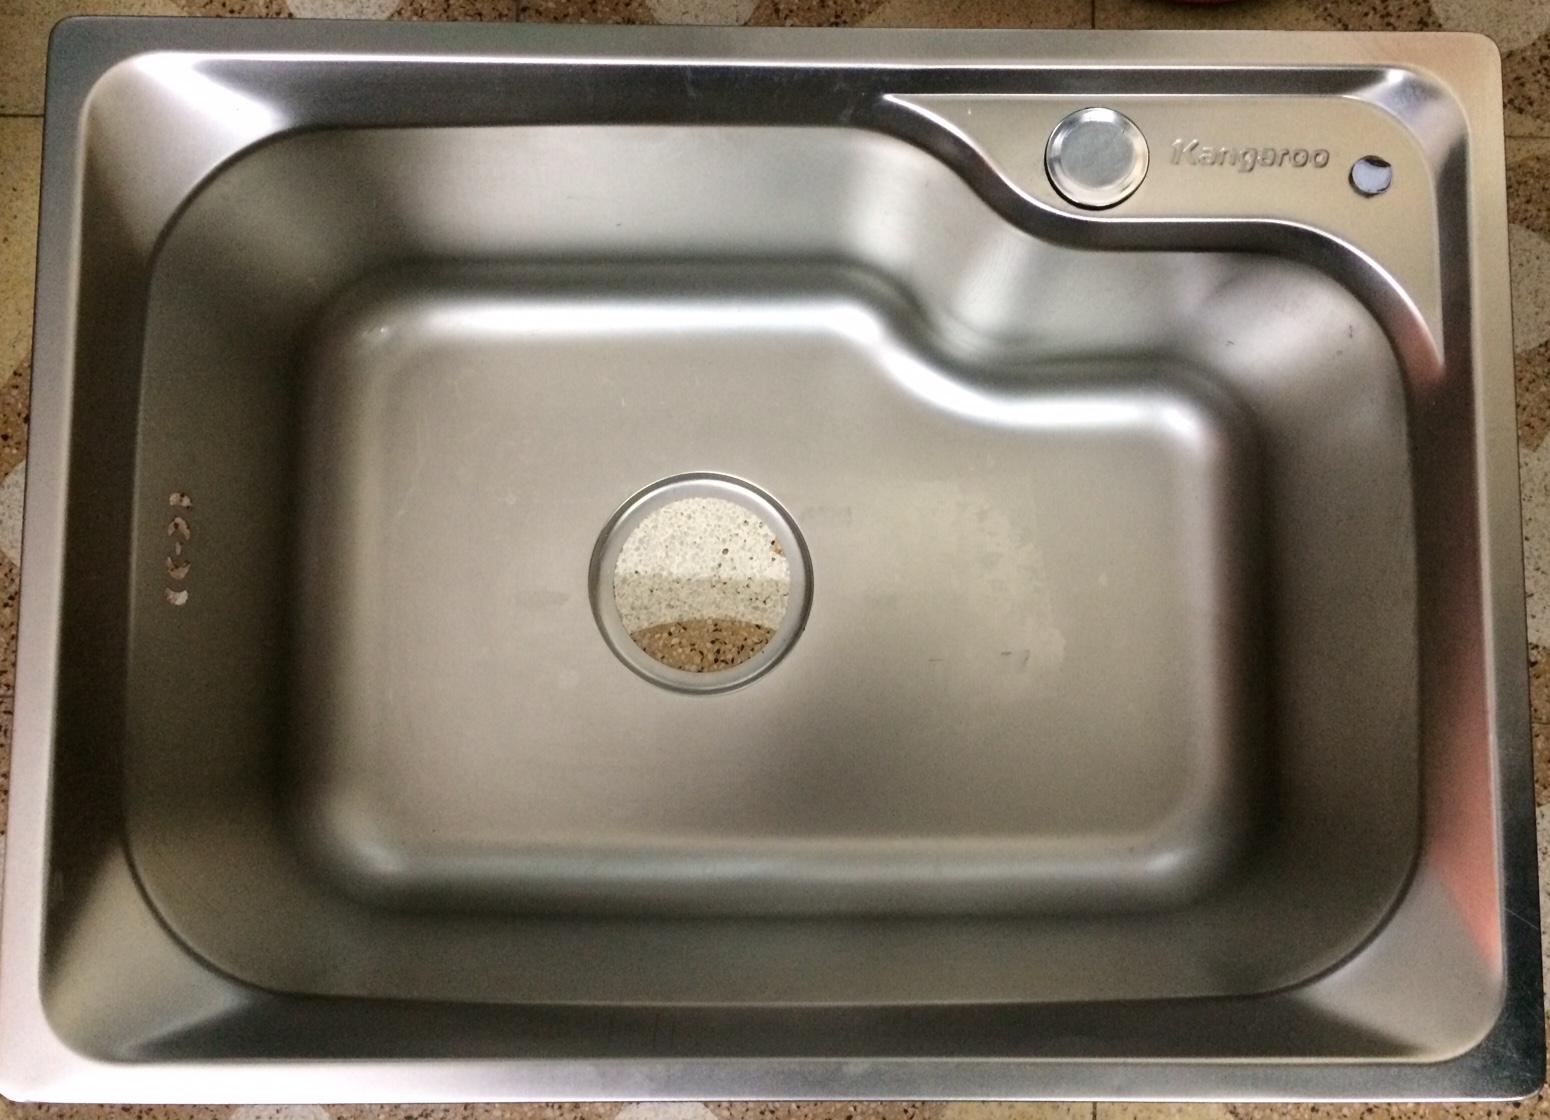 Chậu rửa bát inox  1hố KANGAROO KG5439